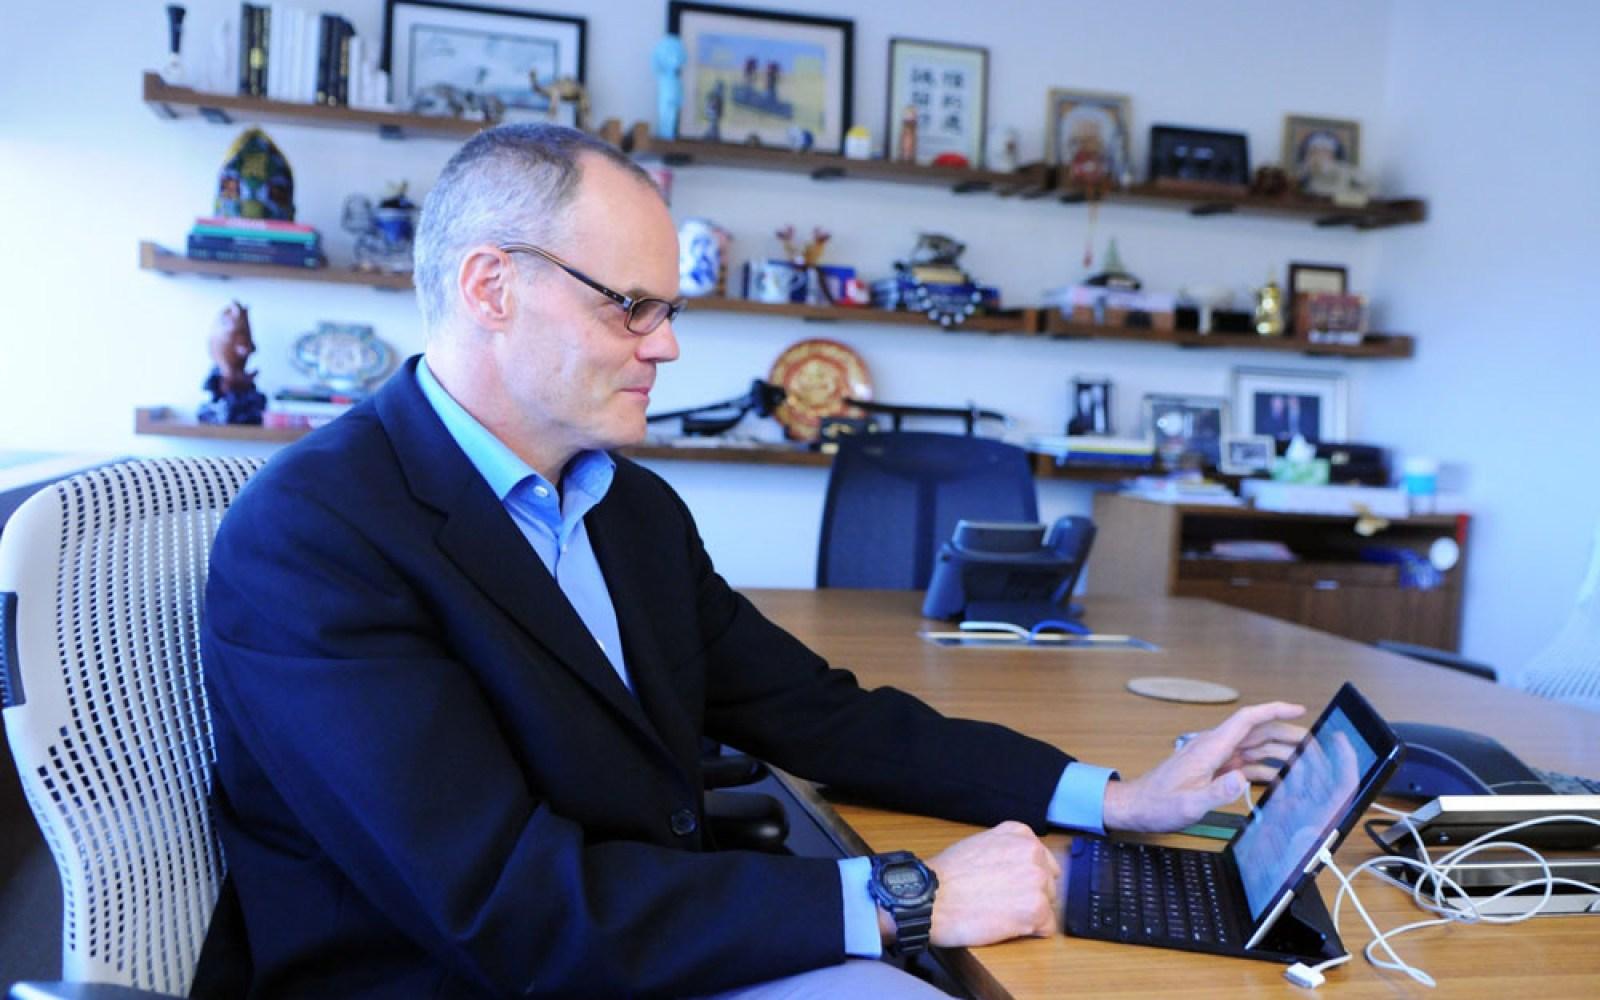 Starwood CEO says iPads make CEOs more productive than PCs